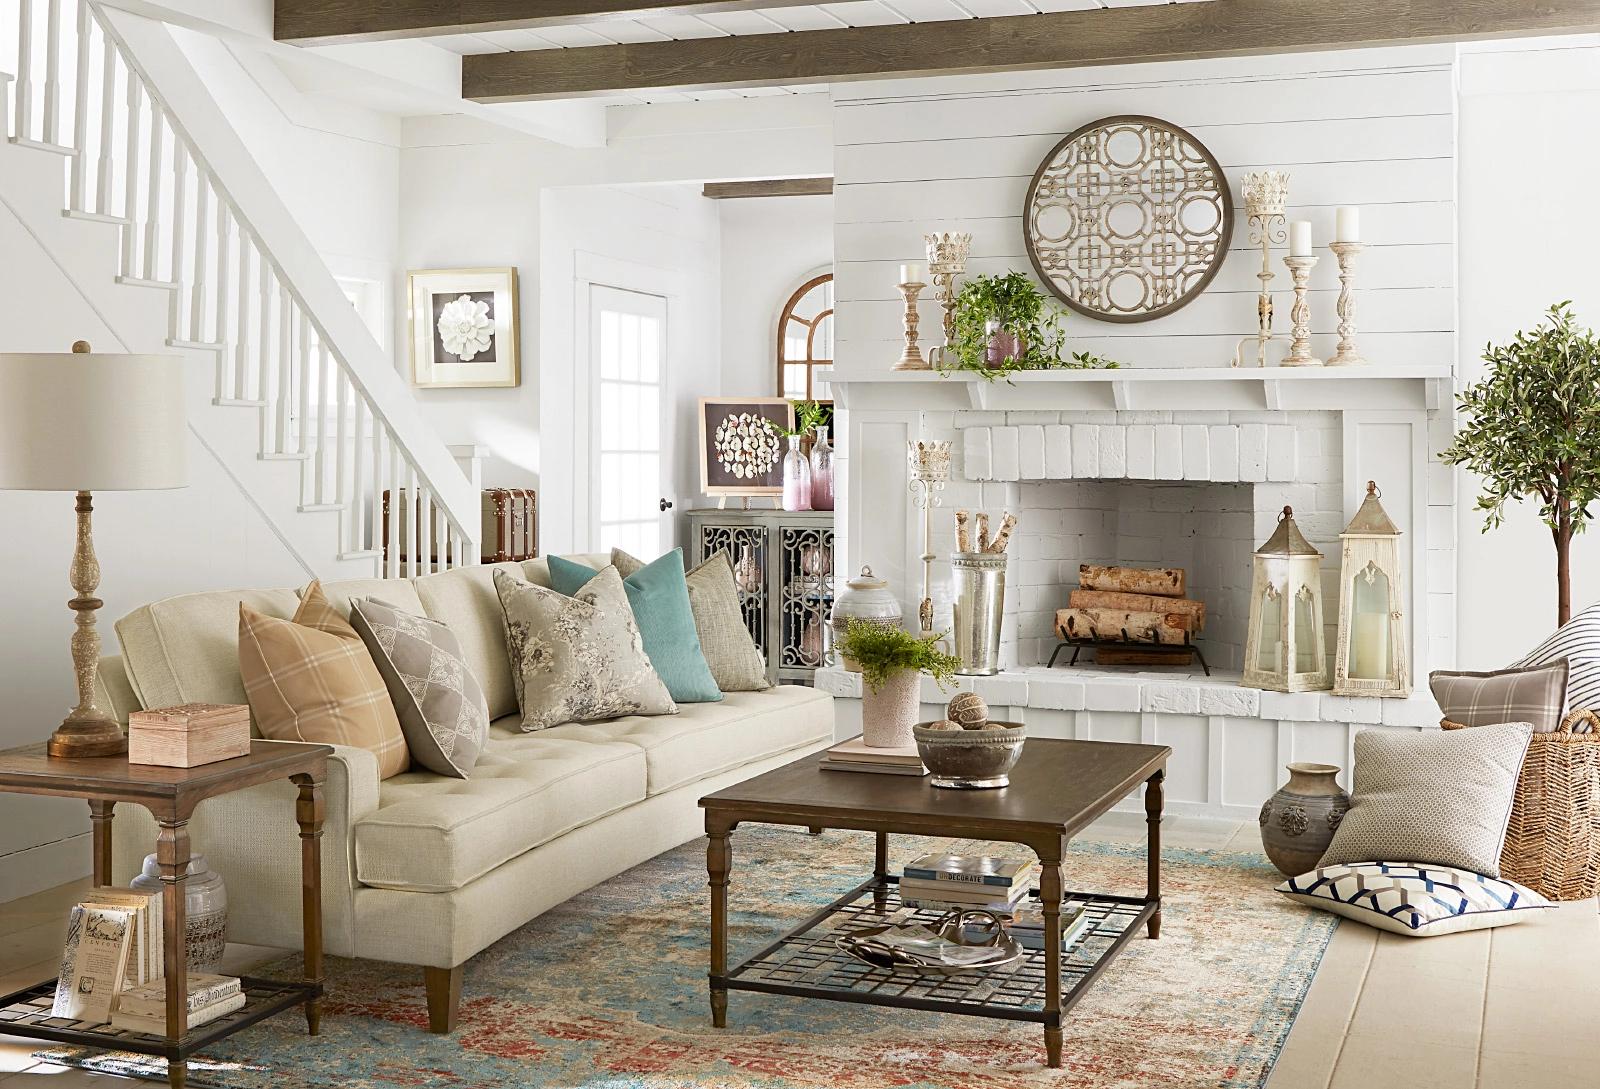 Gianna sofa in French farmhouse living room